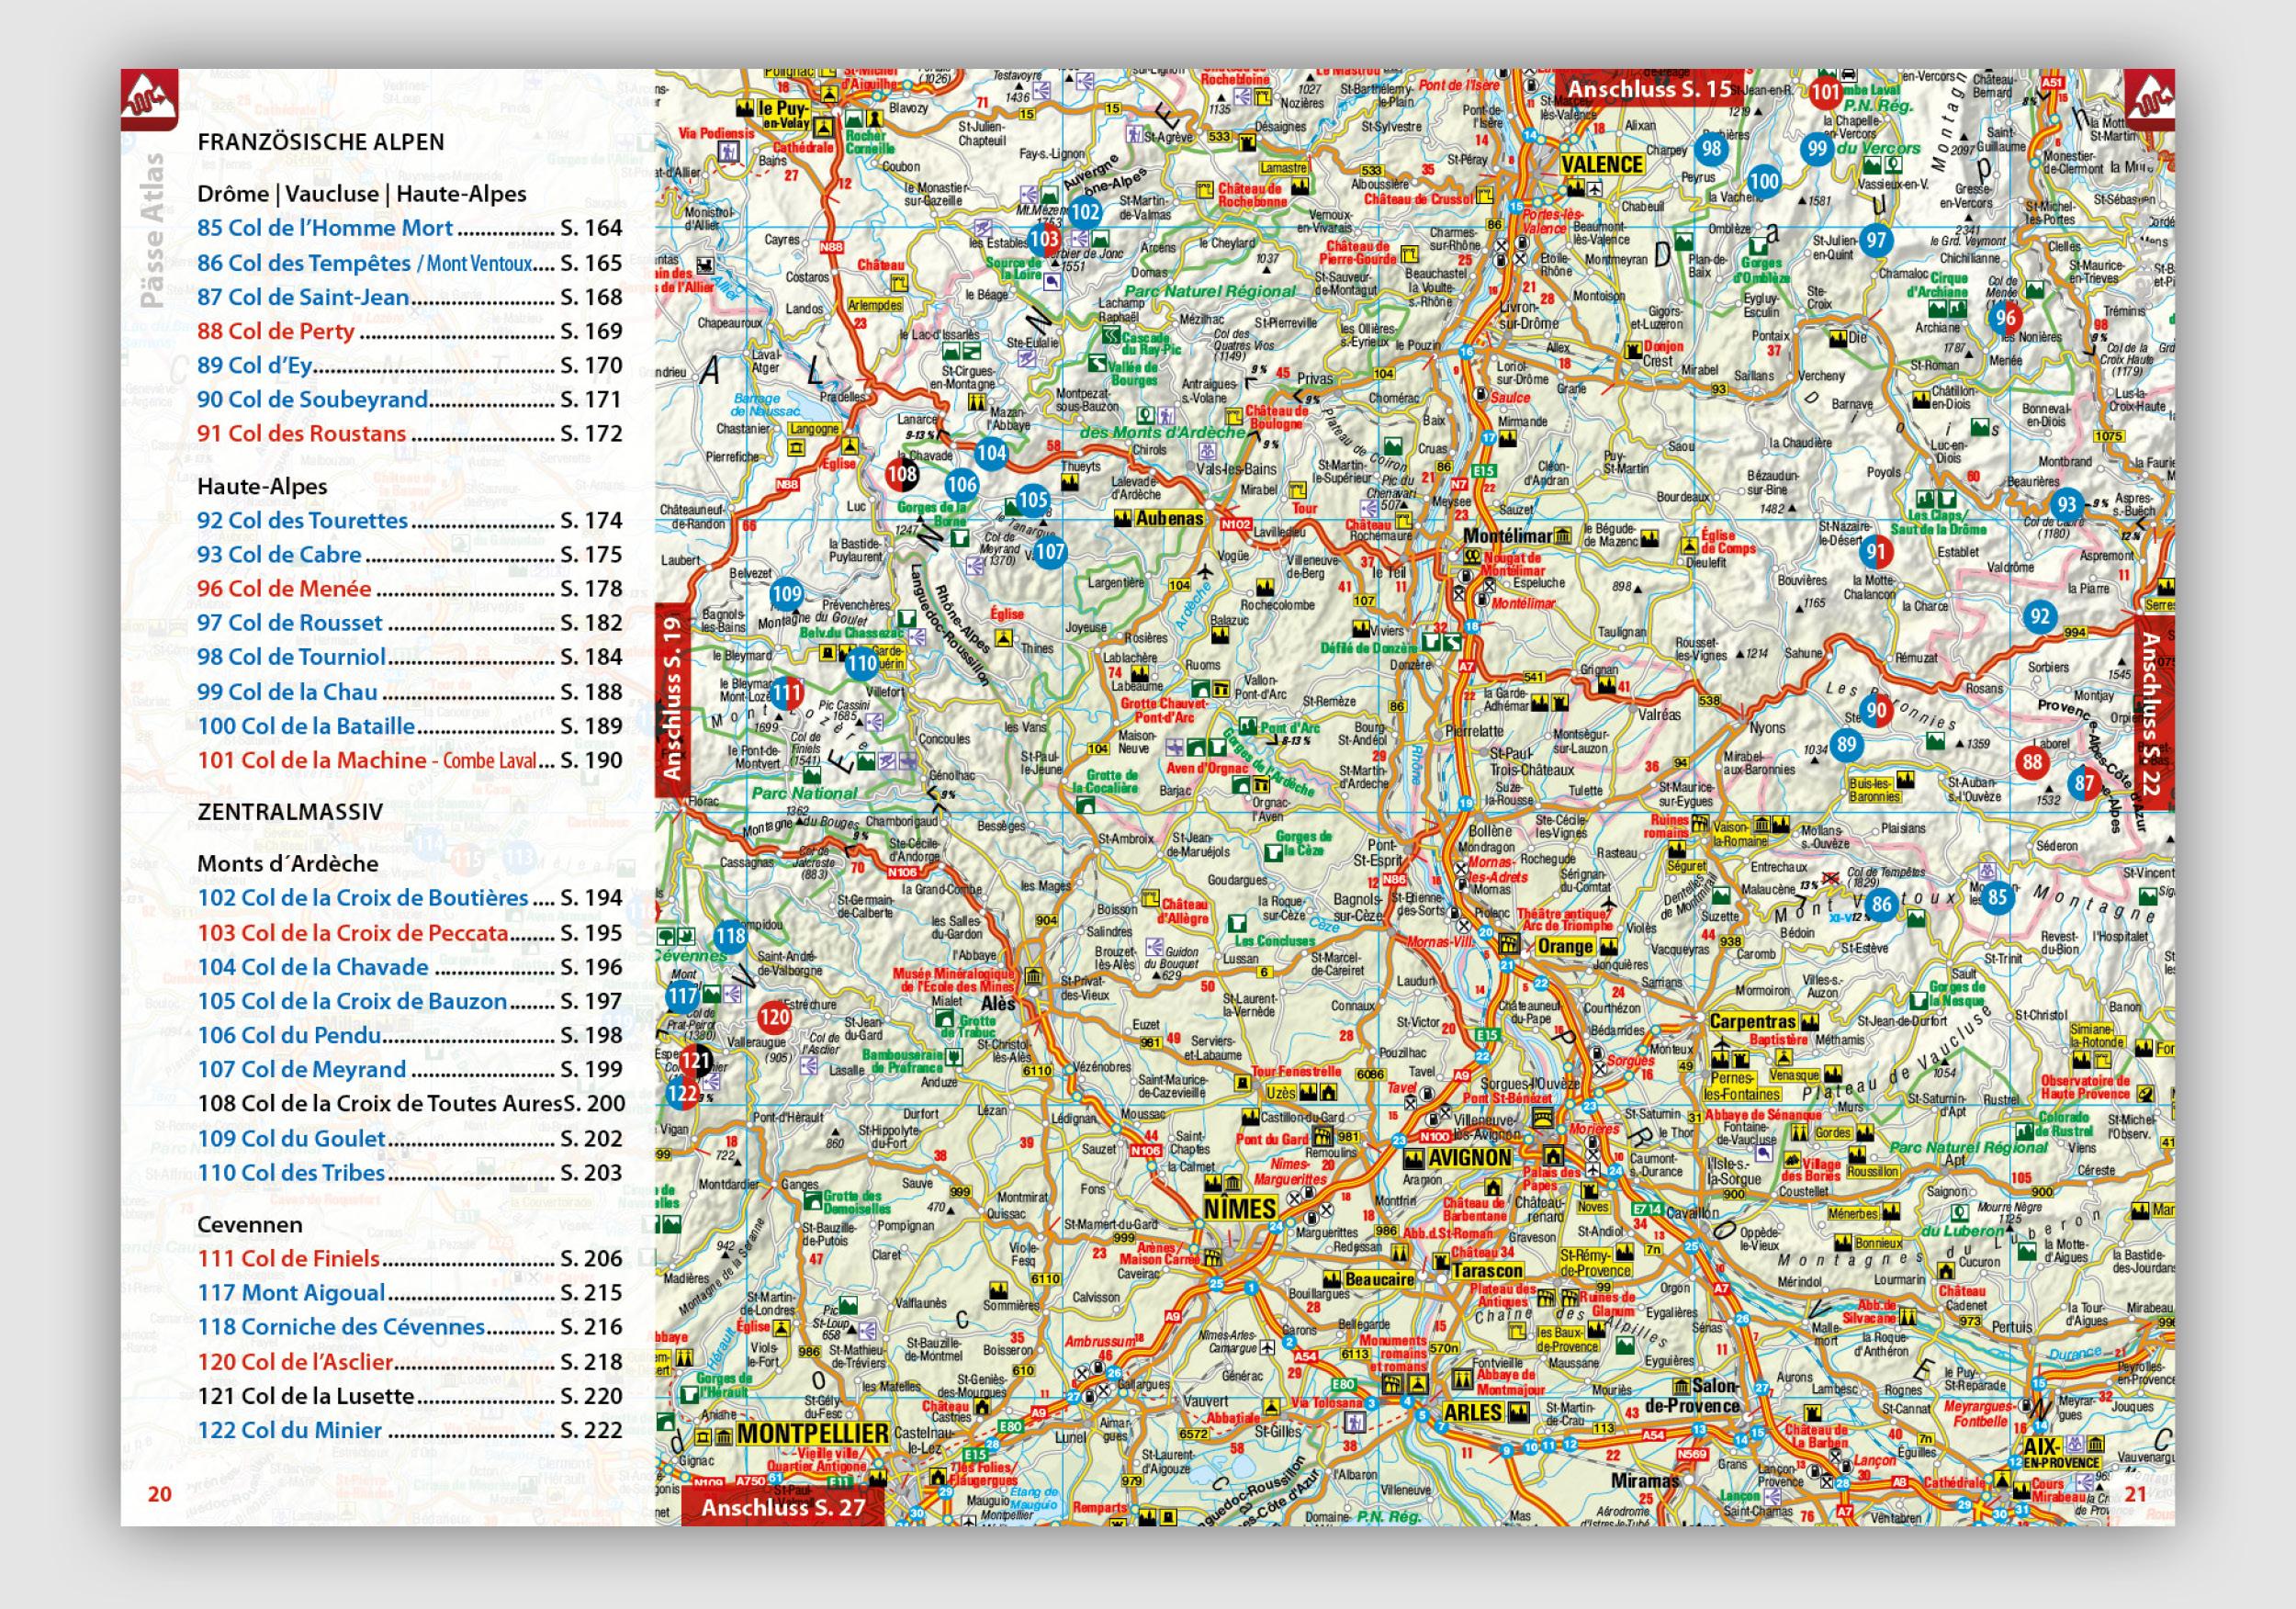 Alpenpässe Karte.Neu Pässe Atlas 2019 Frankreich 183 Pässe Und Panoramastraßen